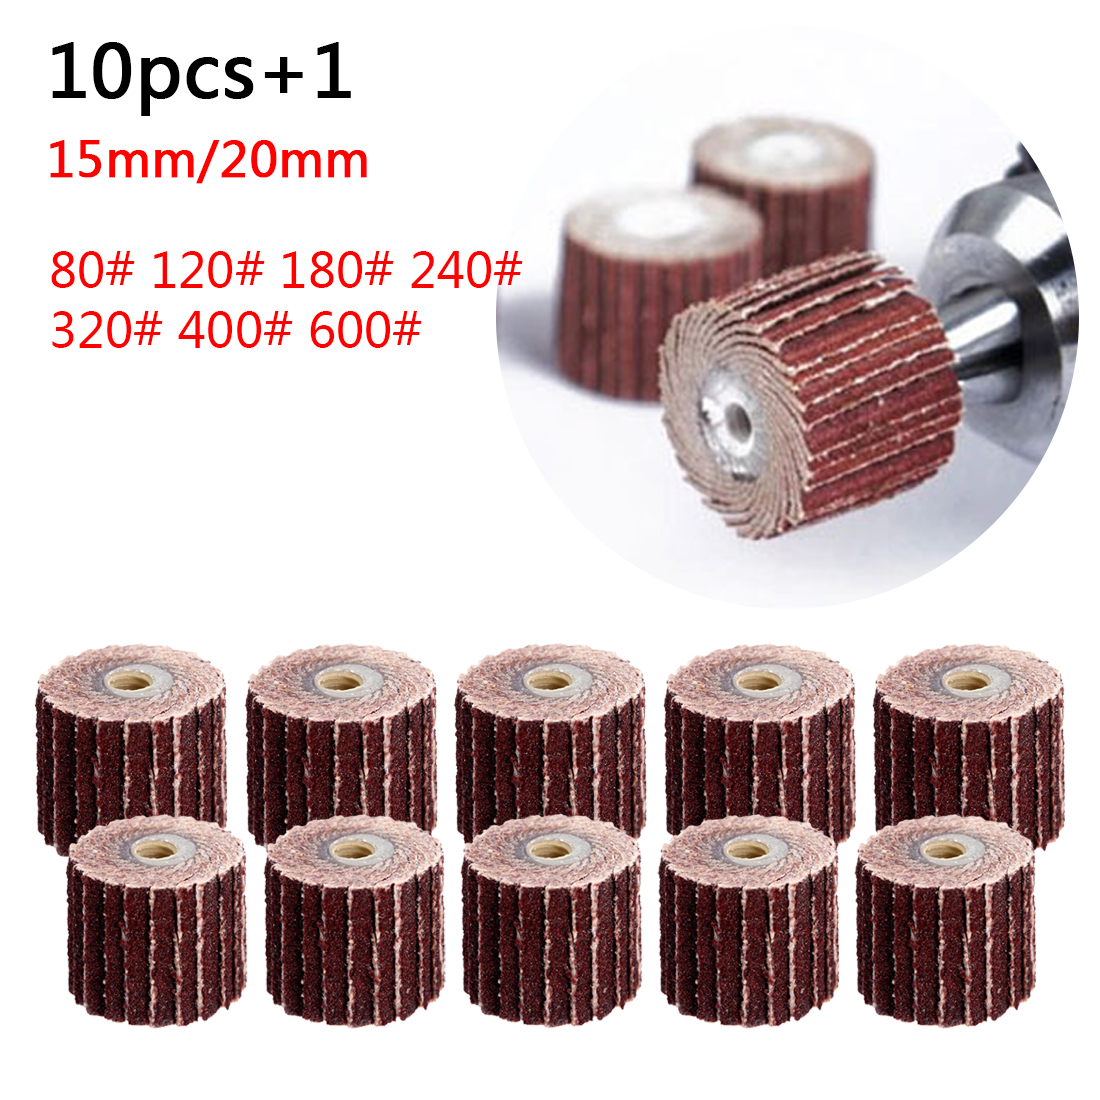 New 10pc Buffing Pad Brush Polishing Wheel Jewelry Metal Micro-Electronic Dremel For Rotary Tools Nylon Polishing Pads